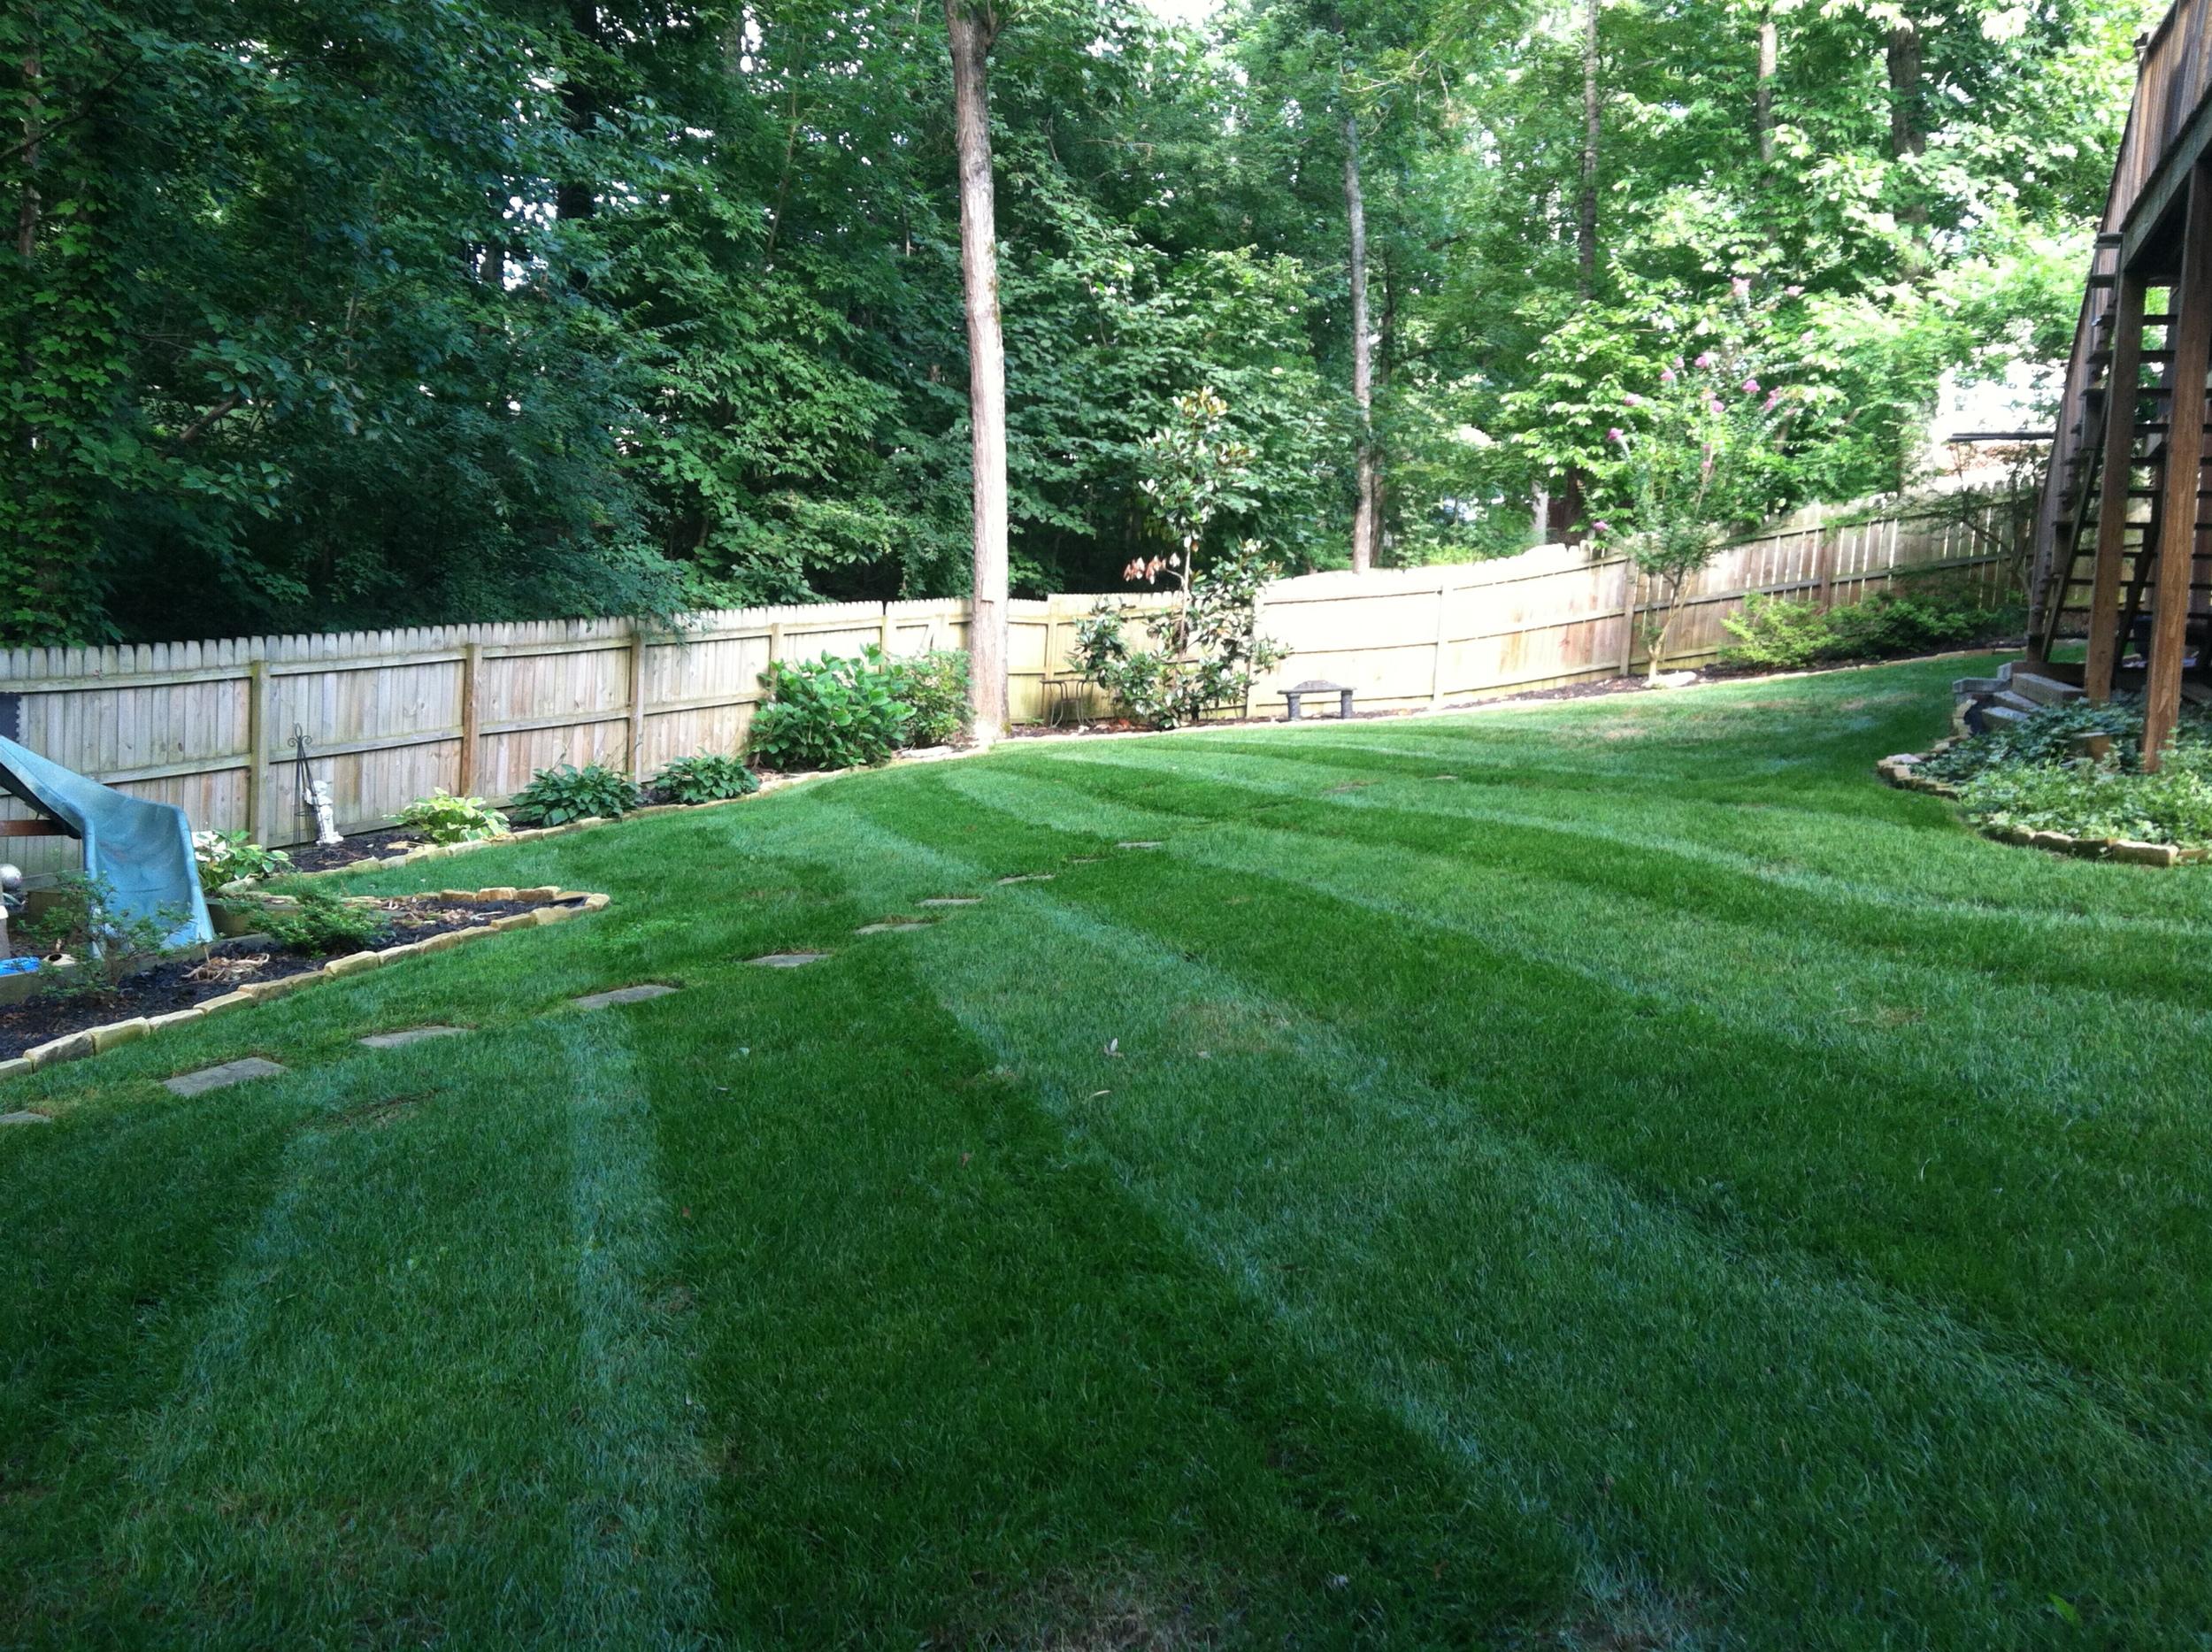 beautiful-lawn-care-backyard-by-hixson-landscape-contractors.jpg